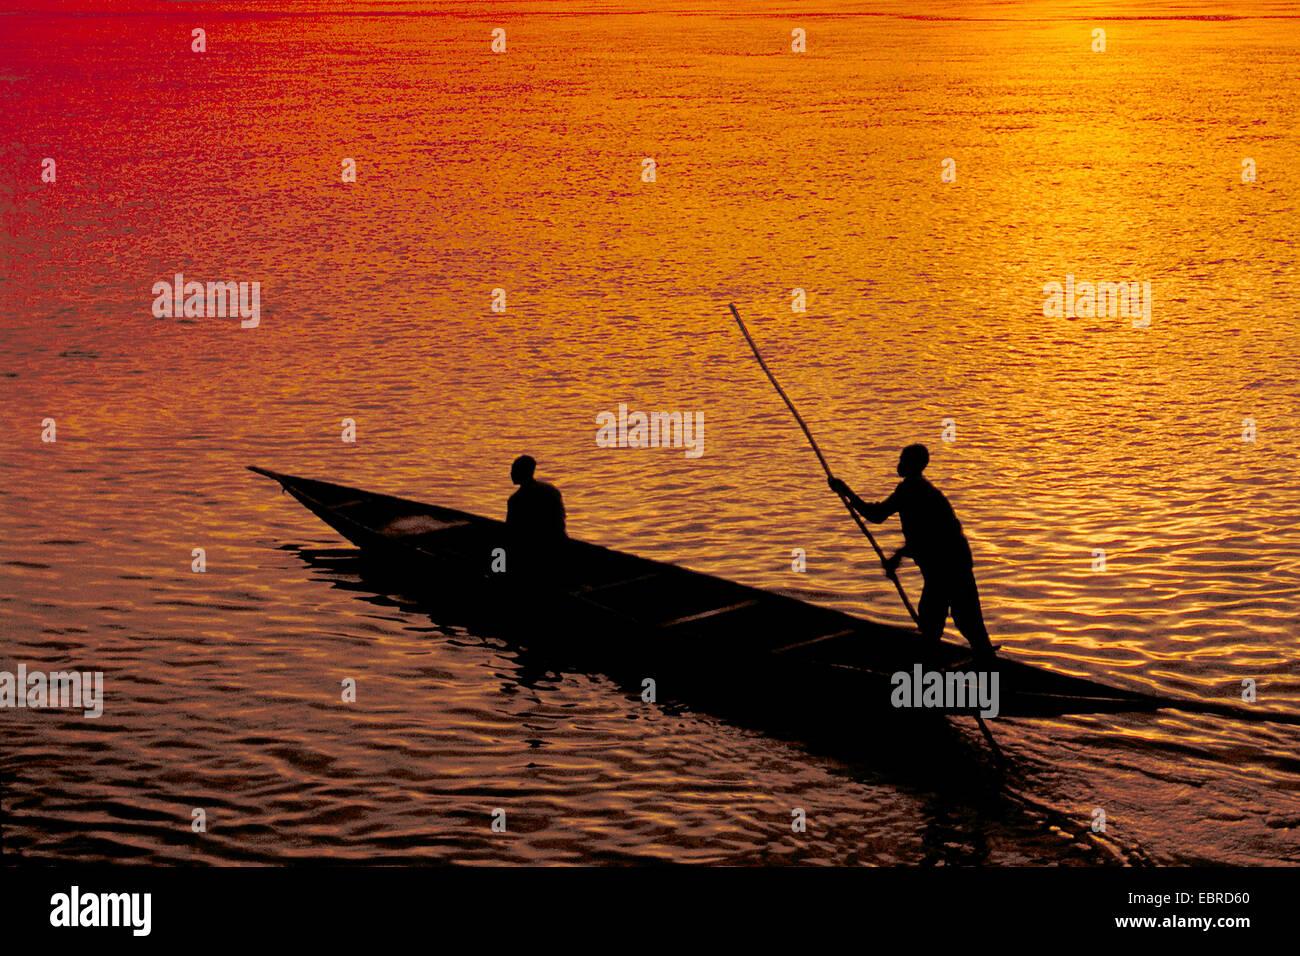 Boot Angeln bei Sonnenuntergang, Mali Stockbild